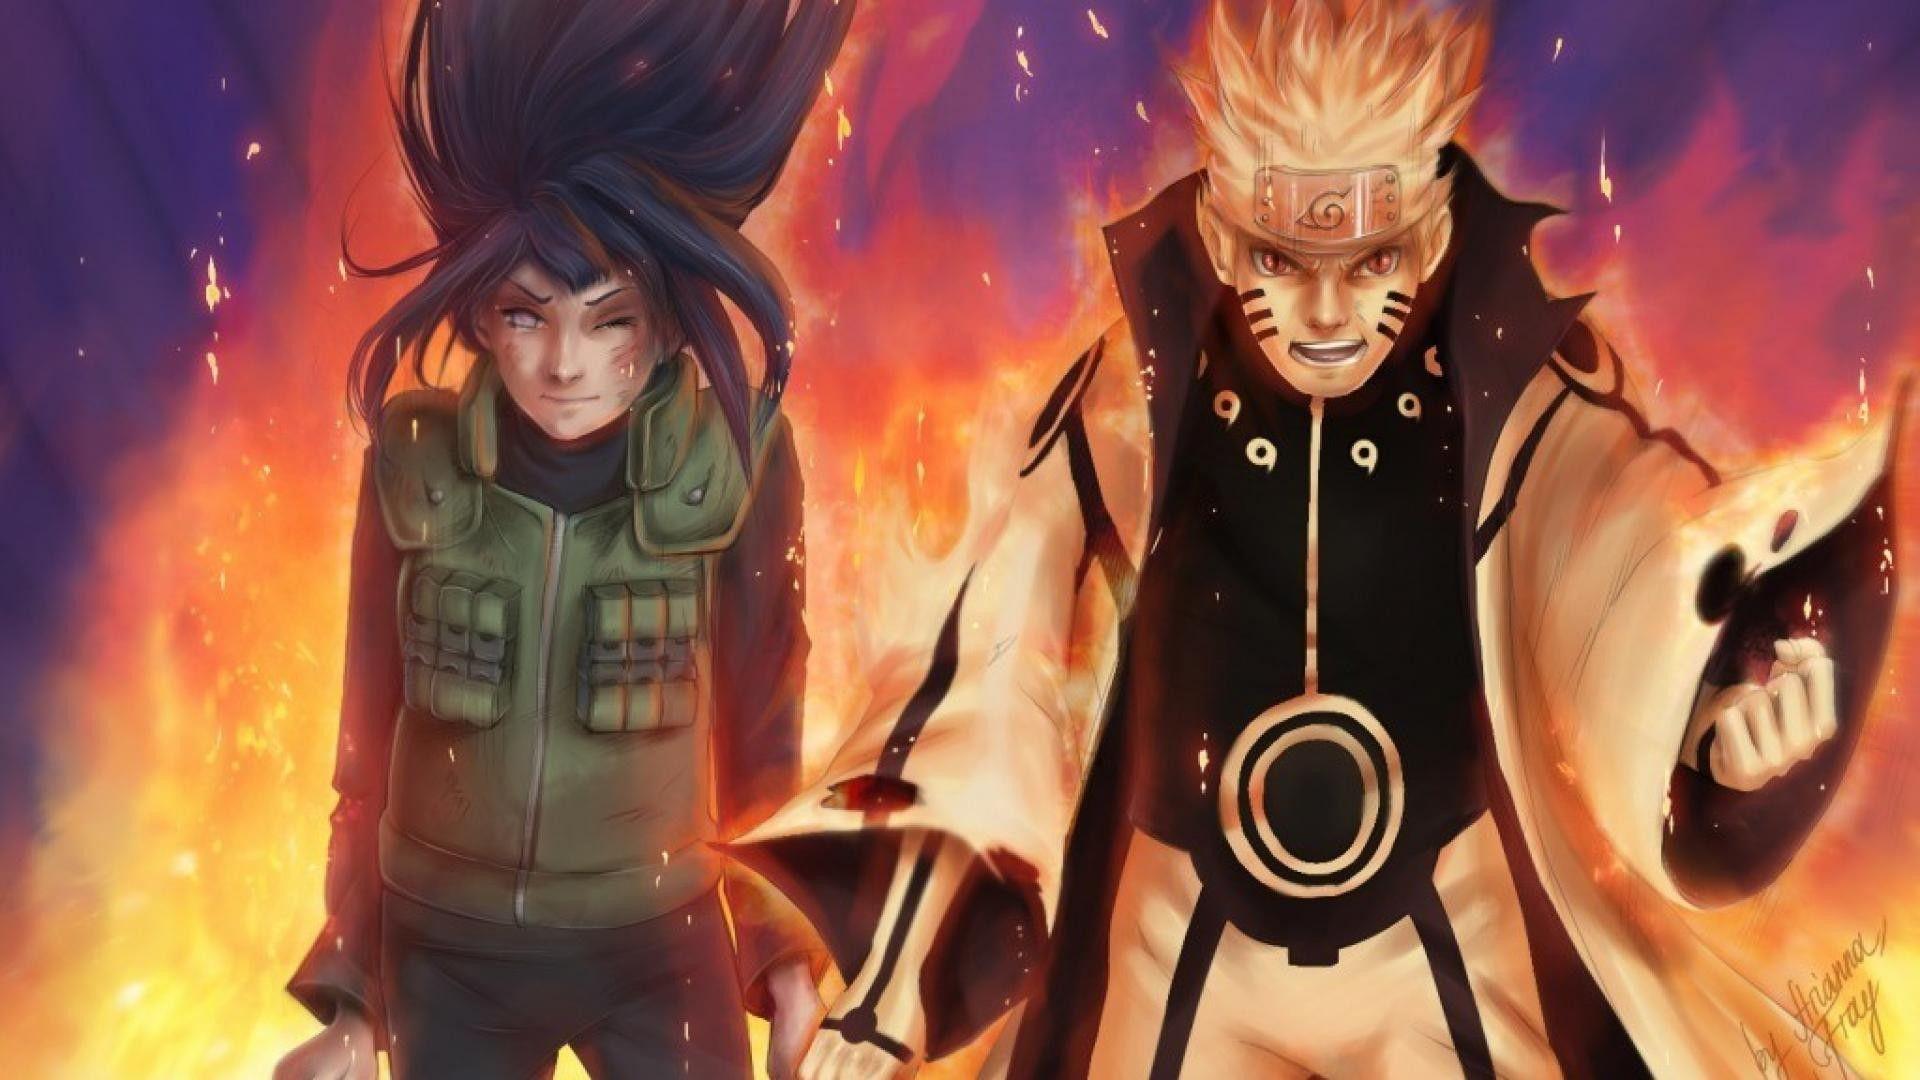 Naruto &Naruto Shippuden Filler Episodes List naruto